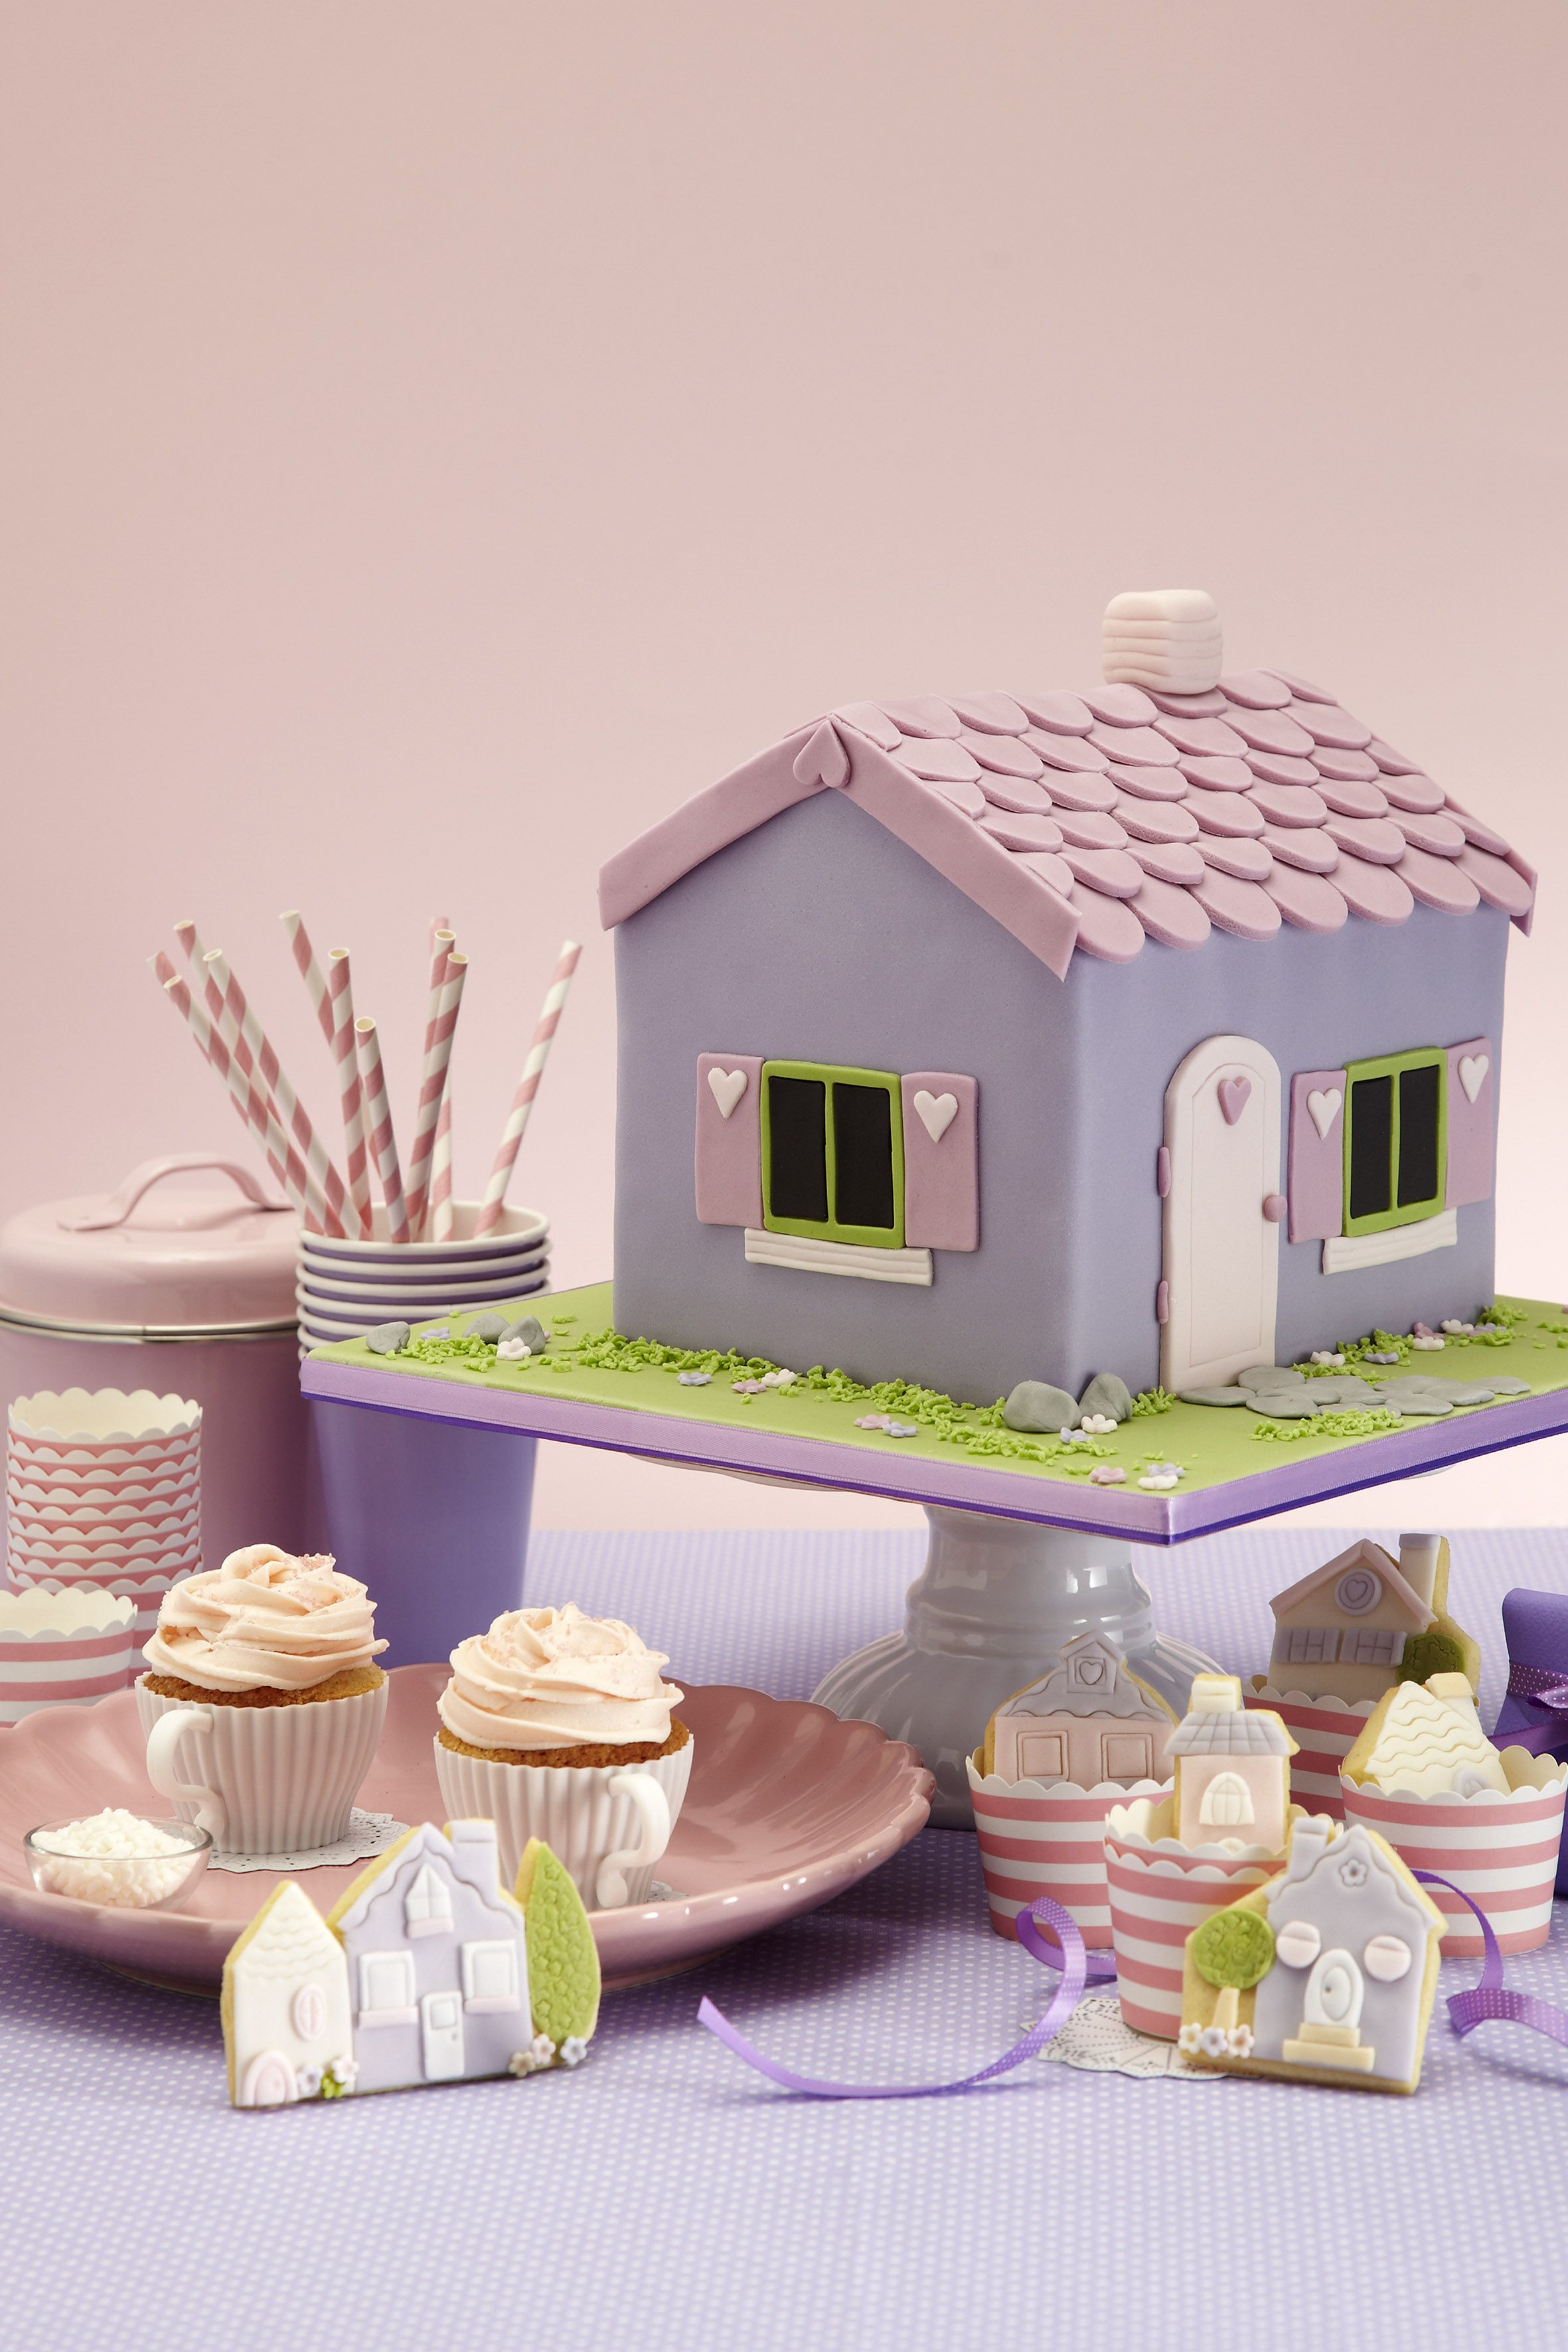 Doll House Cake Party By Hana Rawlings